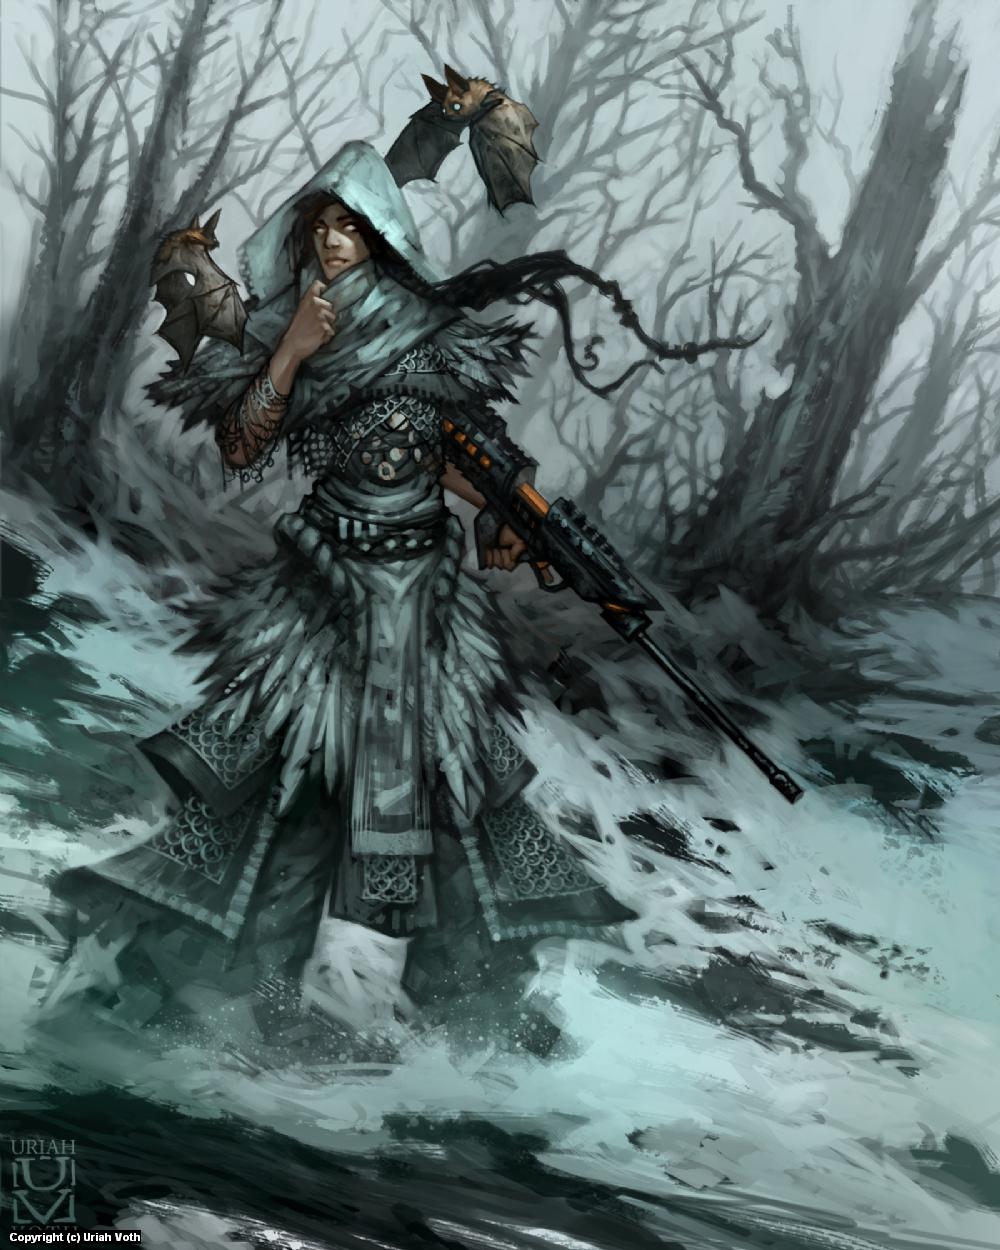 Echo the Blind Sniper Artwork by Uriah Voth